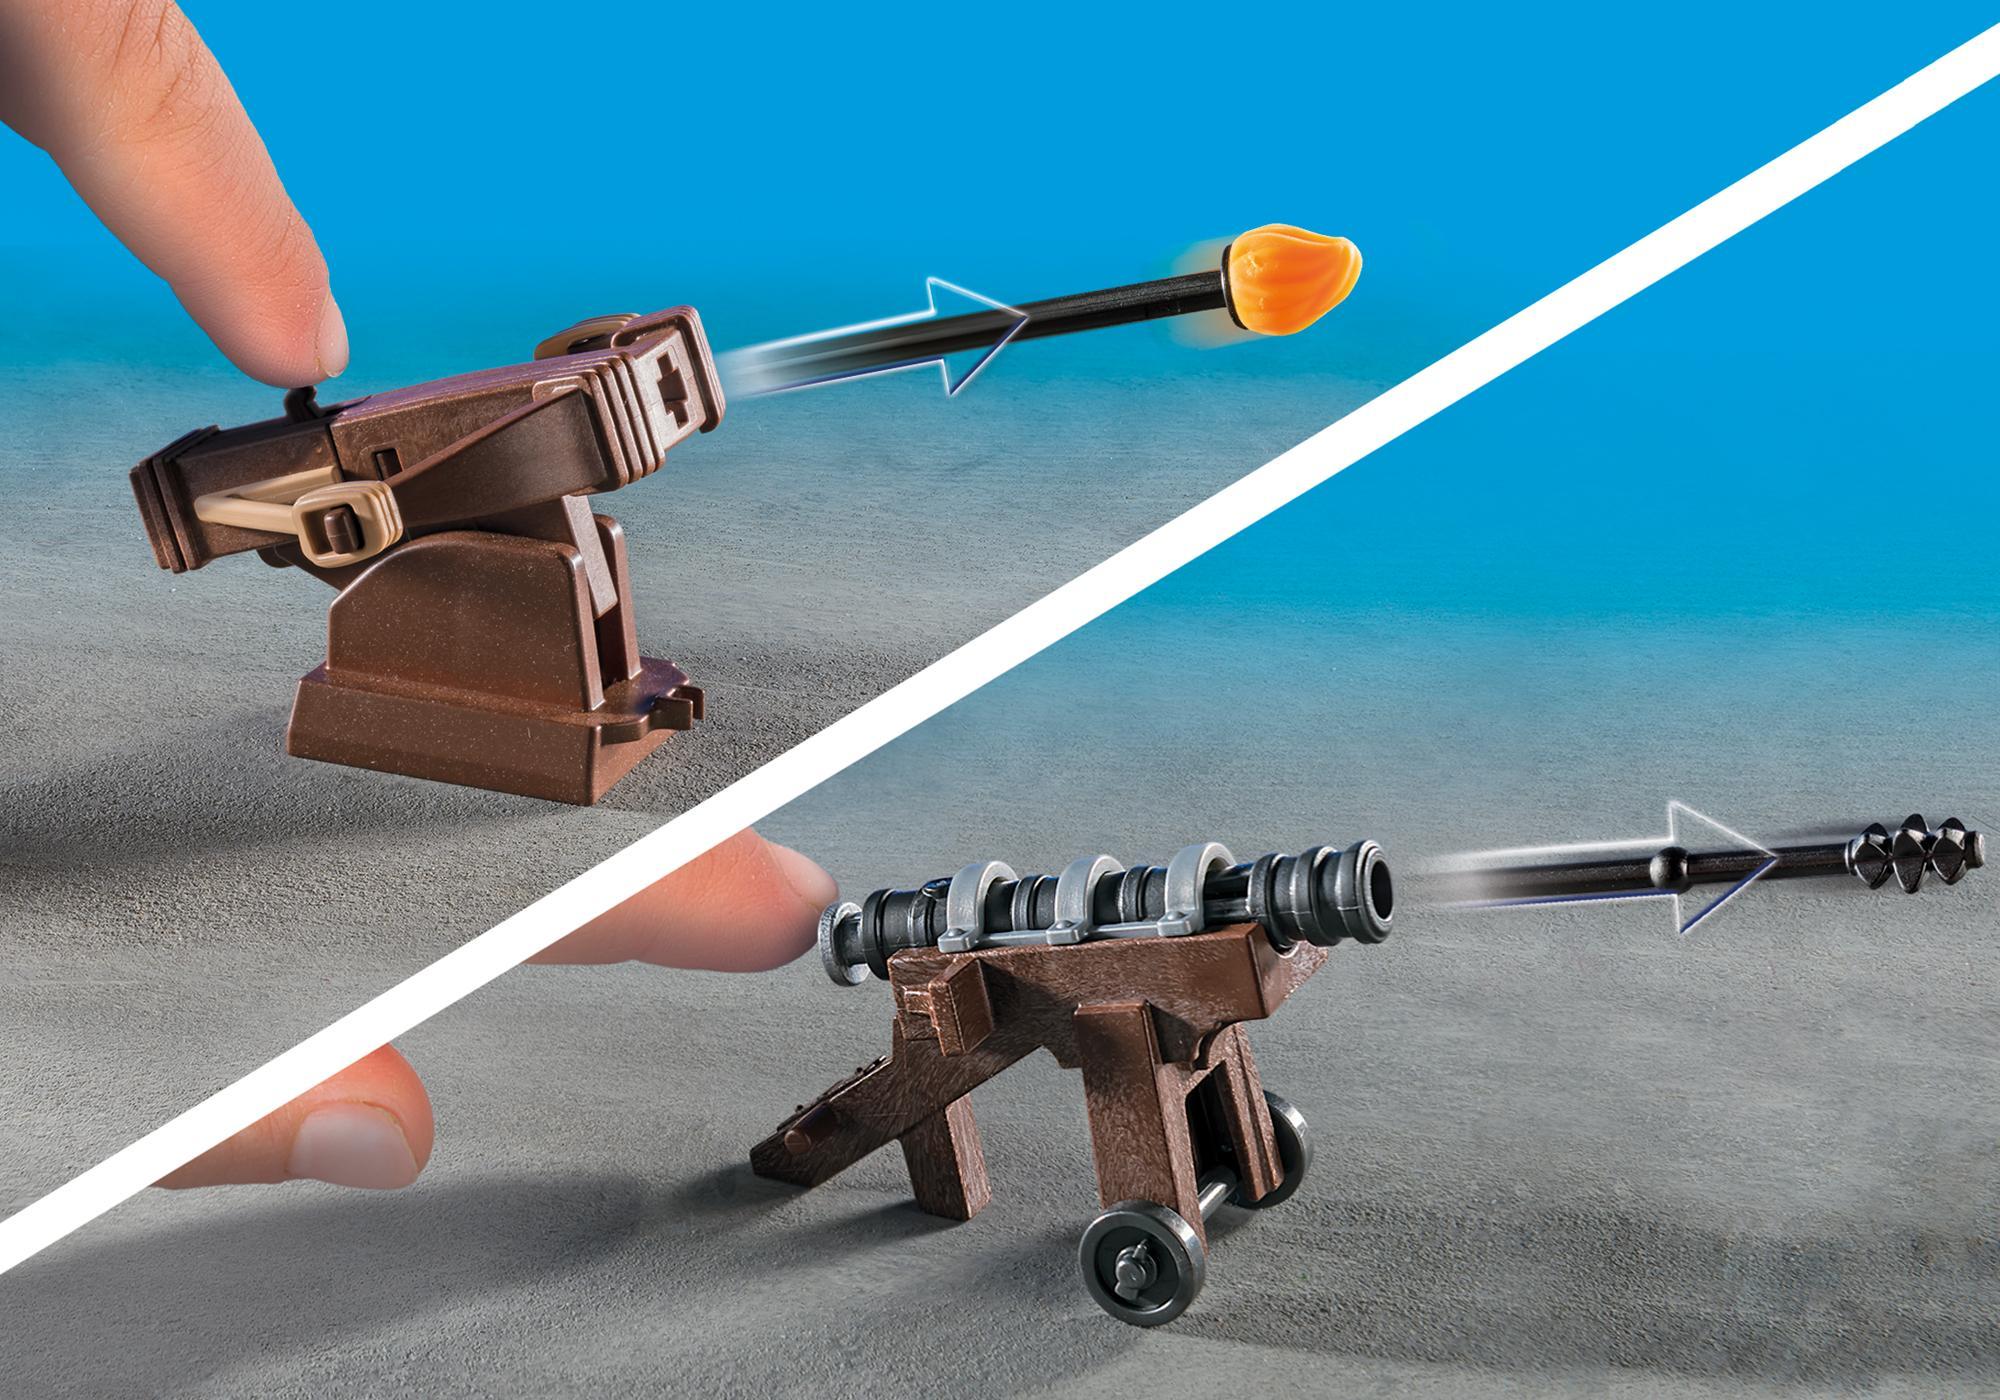 http://media.playmobil.com/i/playmobil/6627_product_extra3/Bastion smoczych rycerzy